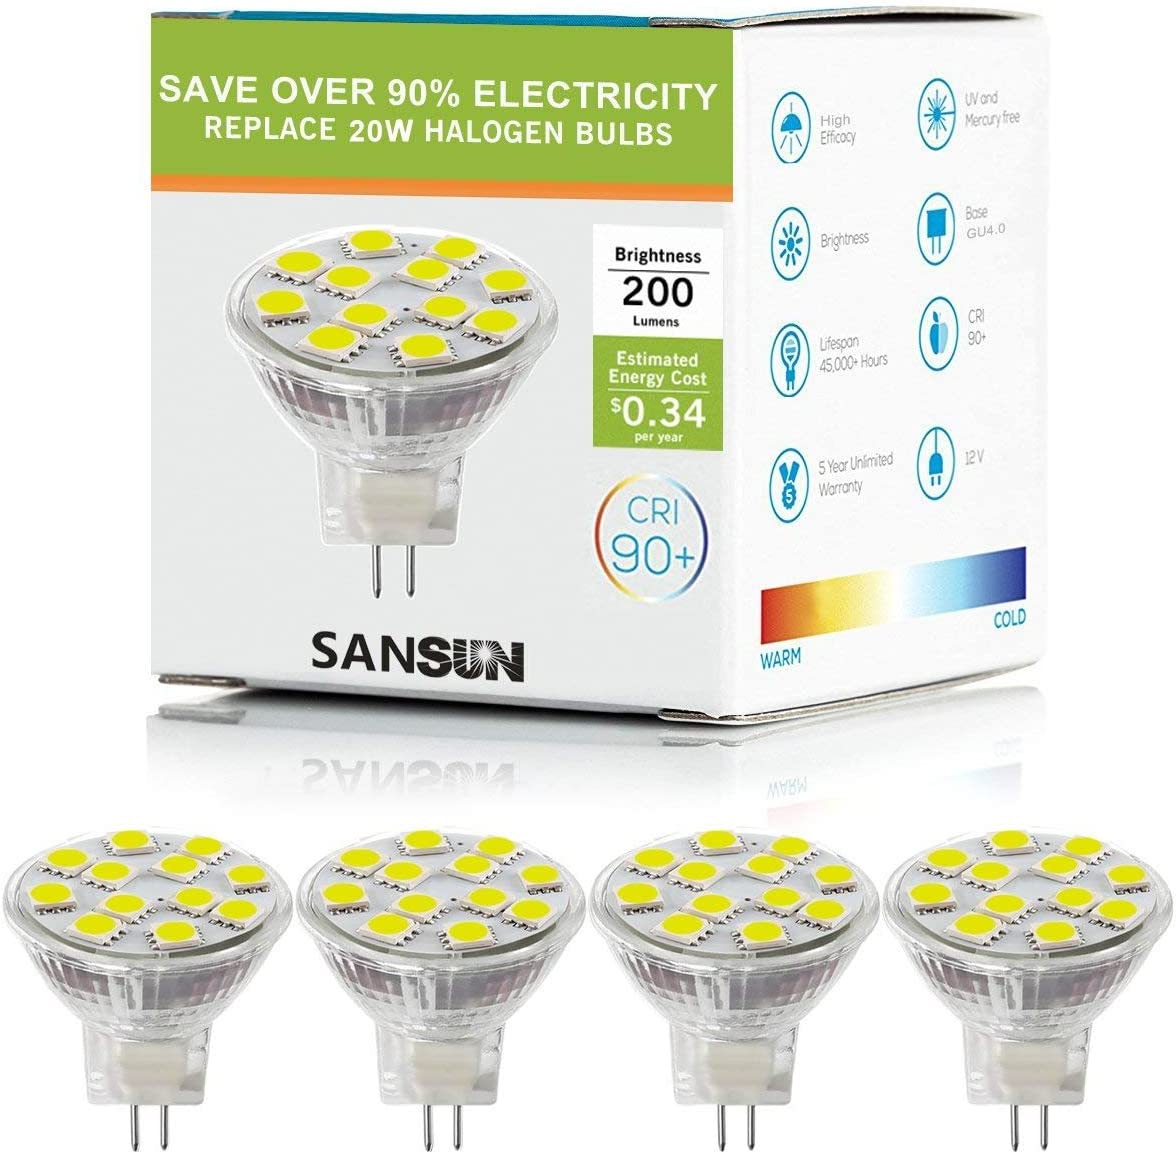 Bombillas LED MR11 de 2 W, 12 V, 20 W, halógeno de repuesto, base de dos pines GU4, plateado, SL12D50506KK